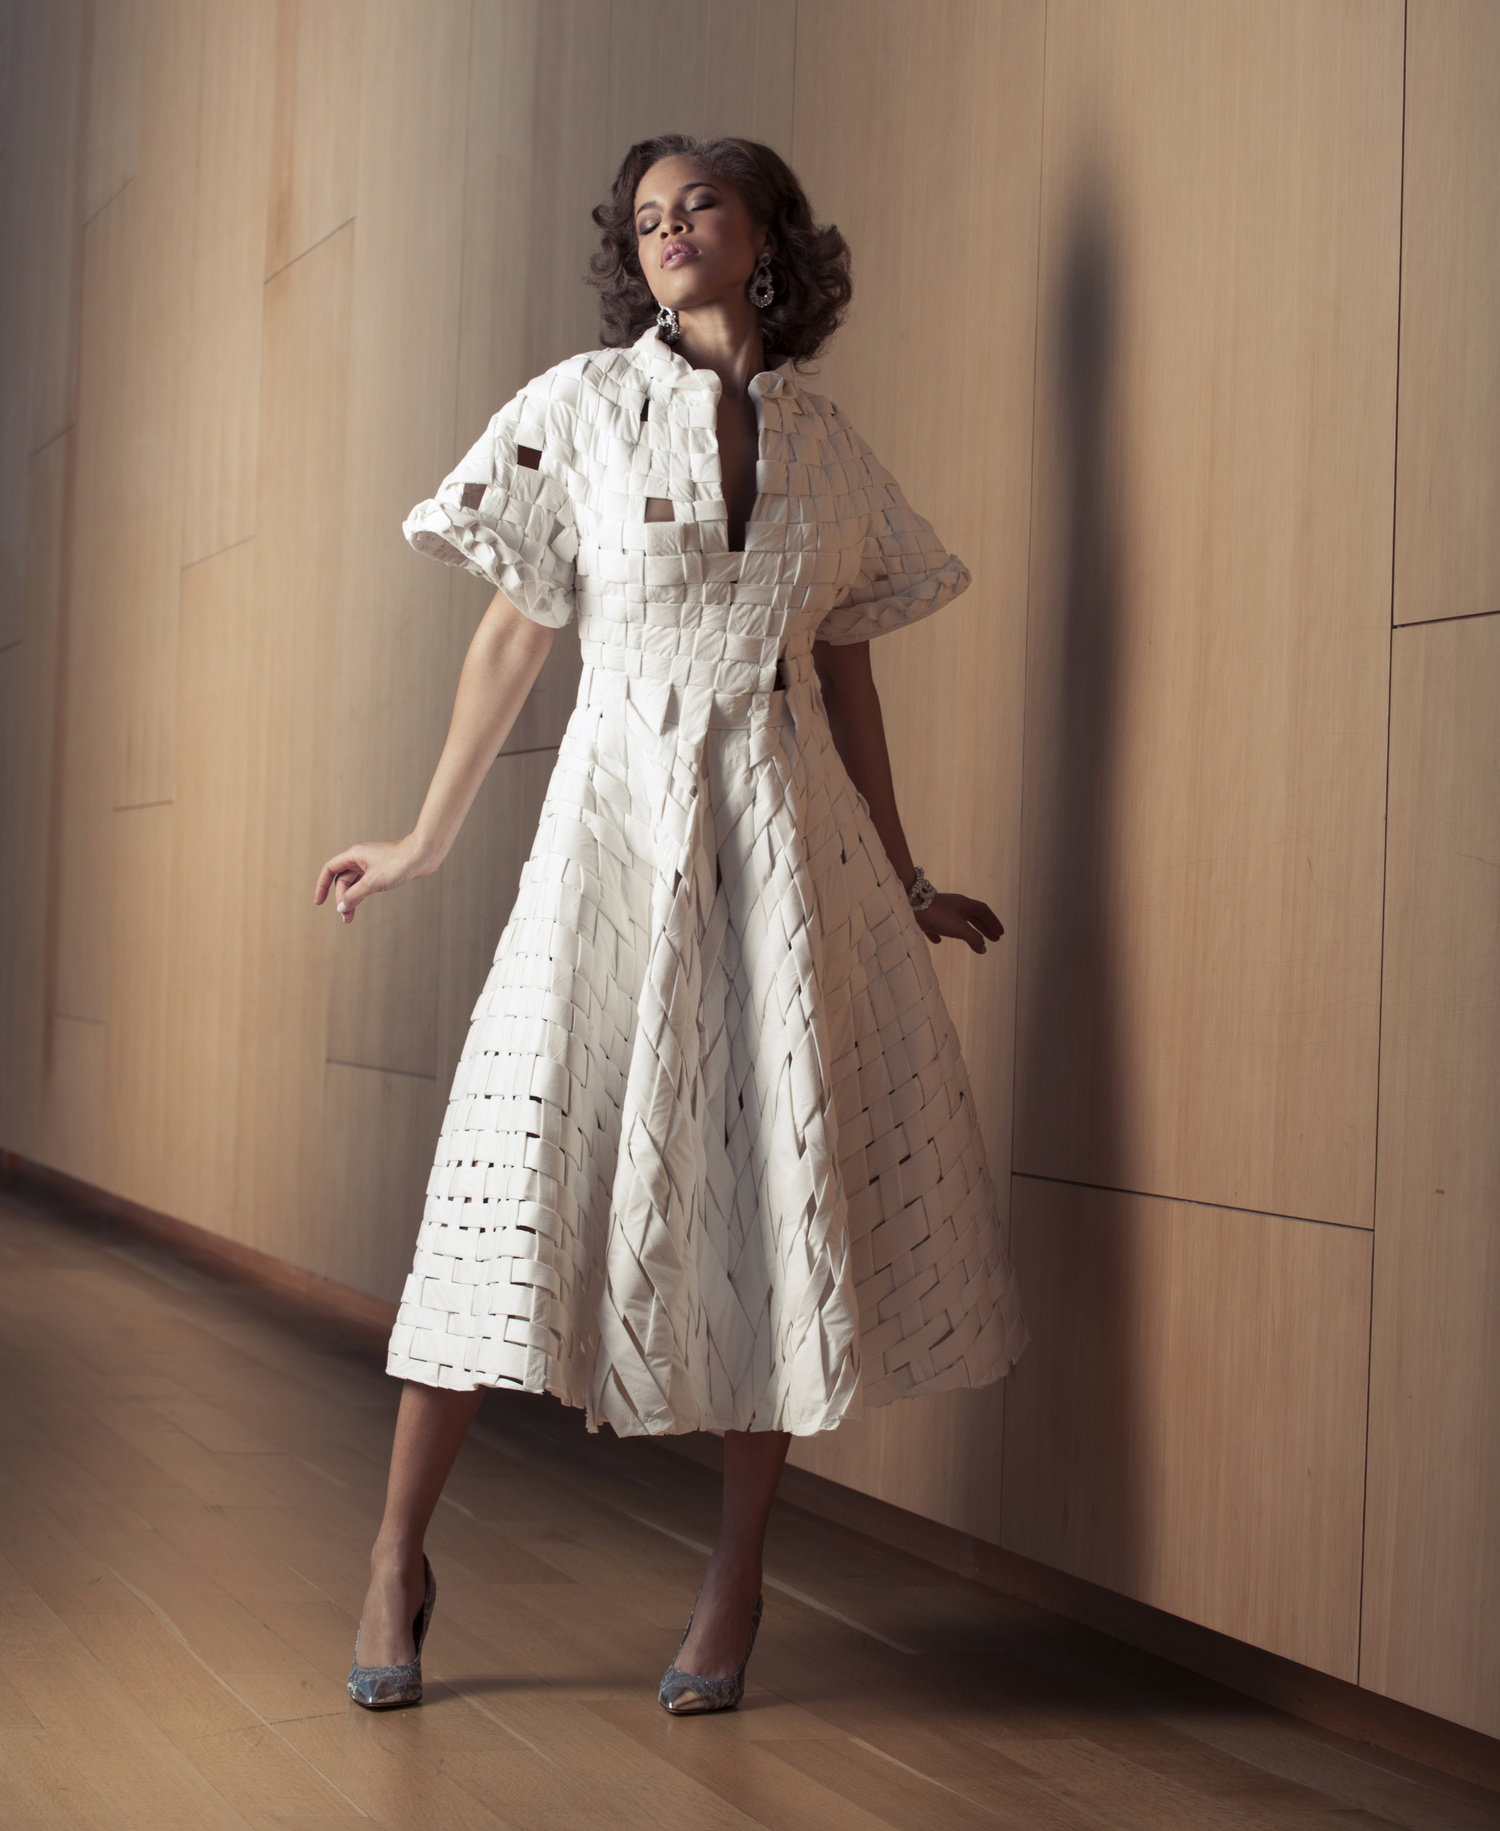 White-Cashmere-Collection-2013-Lucian-Matis-Photographer-Caitlin-Cronenberg.jpg